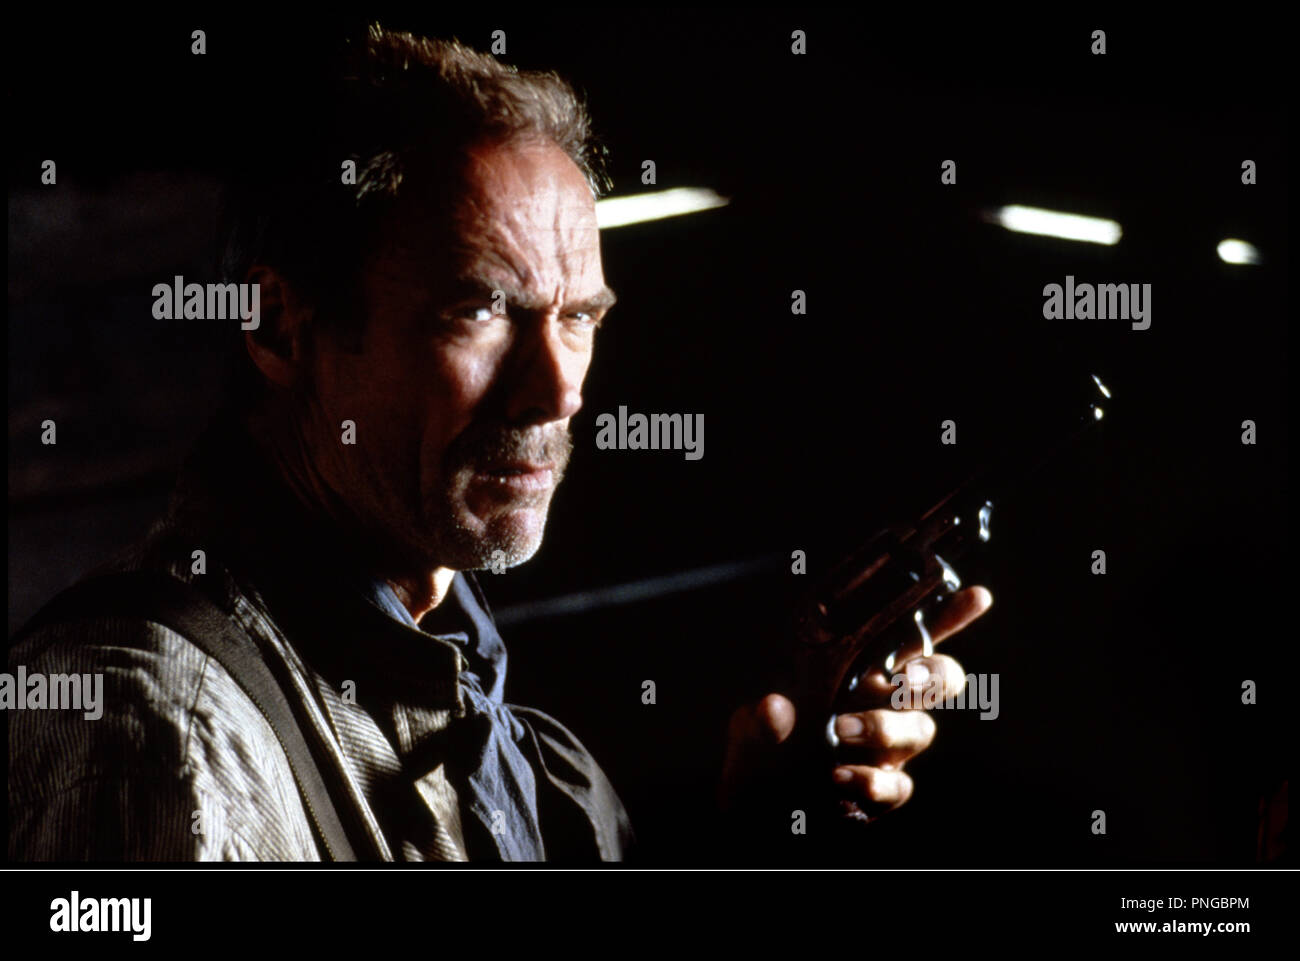 Prod DB © Malpaso - Warner Bros / DR IMPITOYABLE (UNFORGIVEN) de Clint Eastwood 1992 USA avec Clint Eastwood  western, revolver - Stock Image